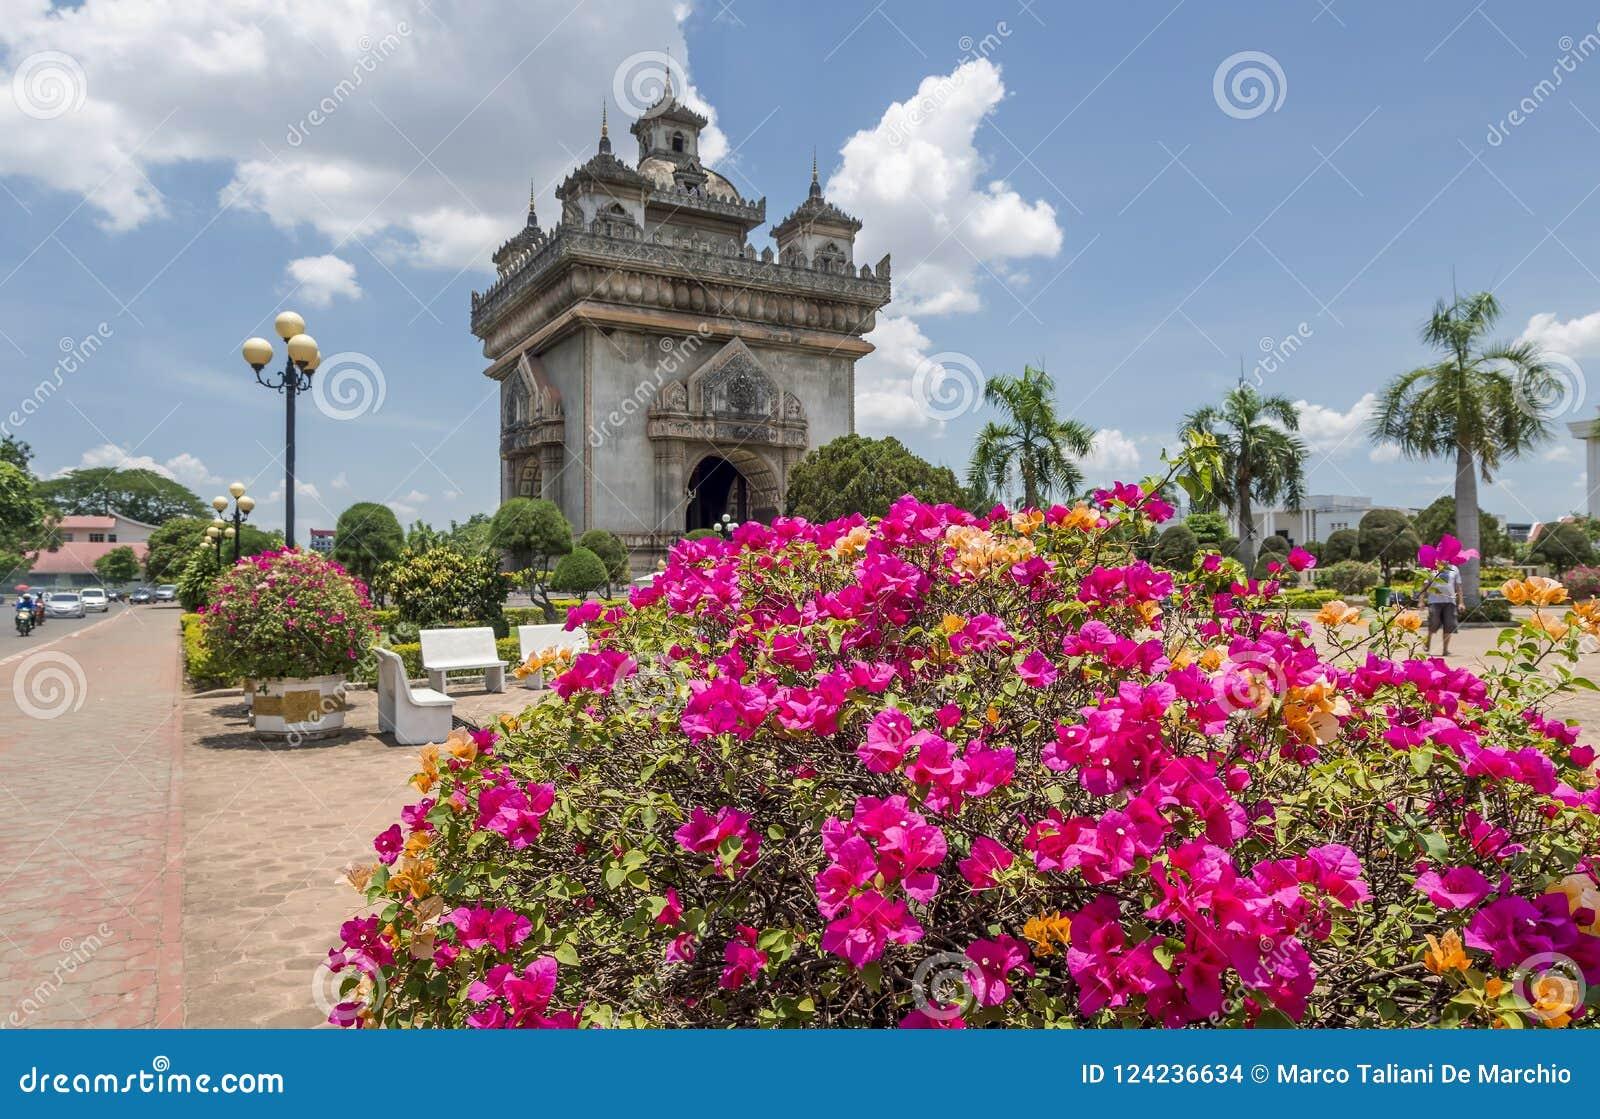 Planta bonita da buganvília com Victory Gate Patuxai no fundo no centro de Vientiane, Laos